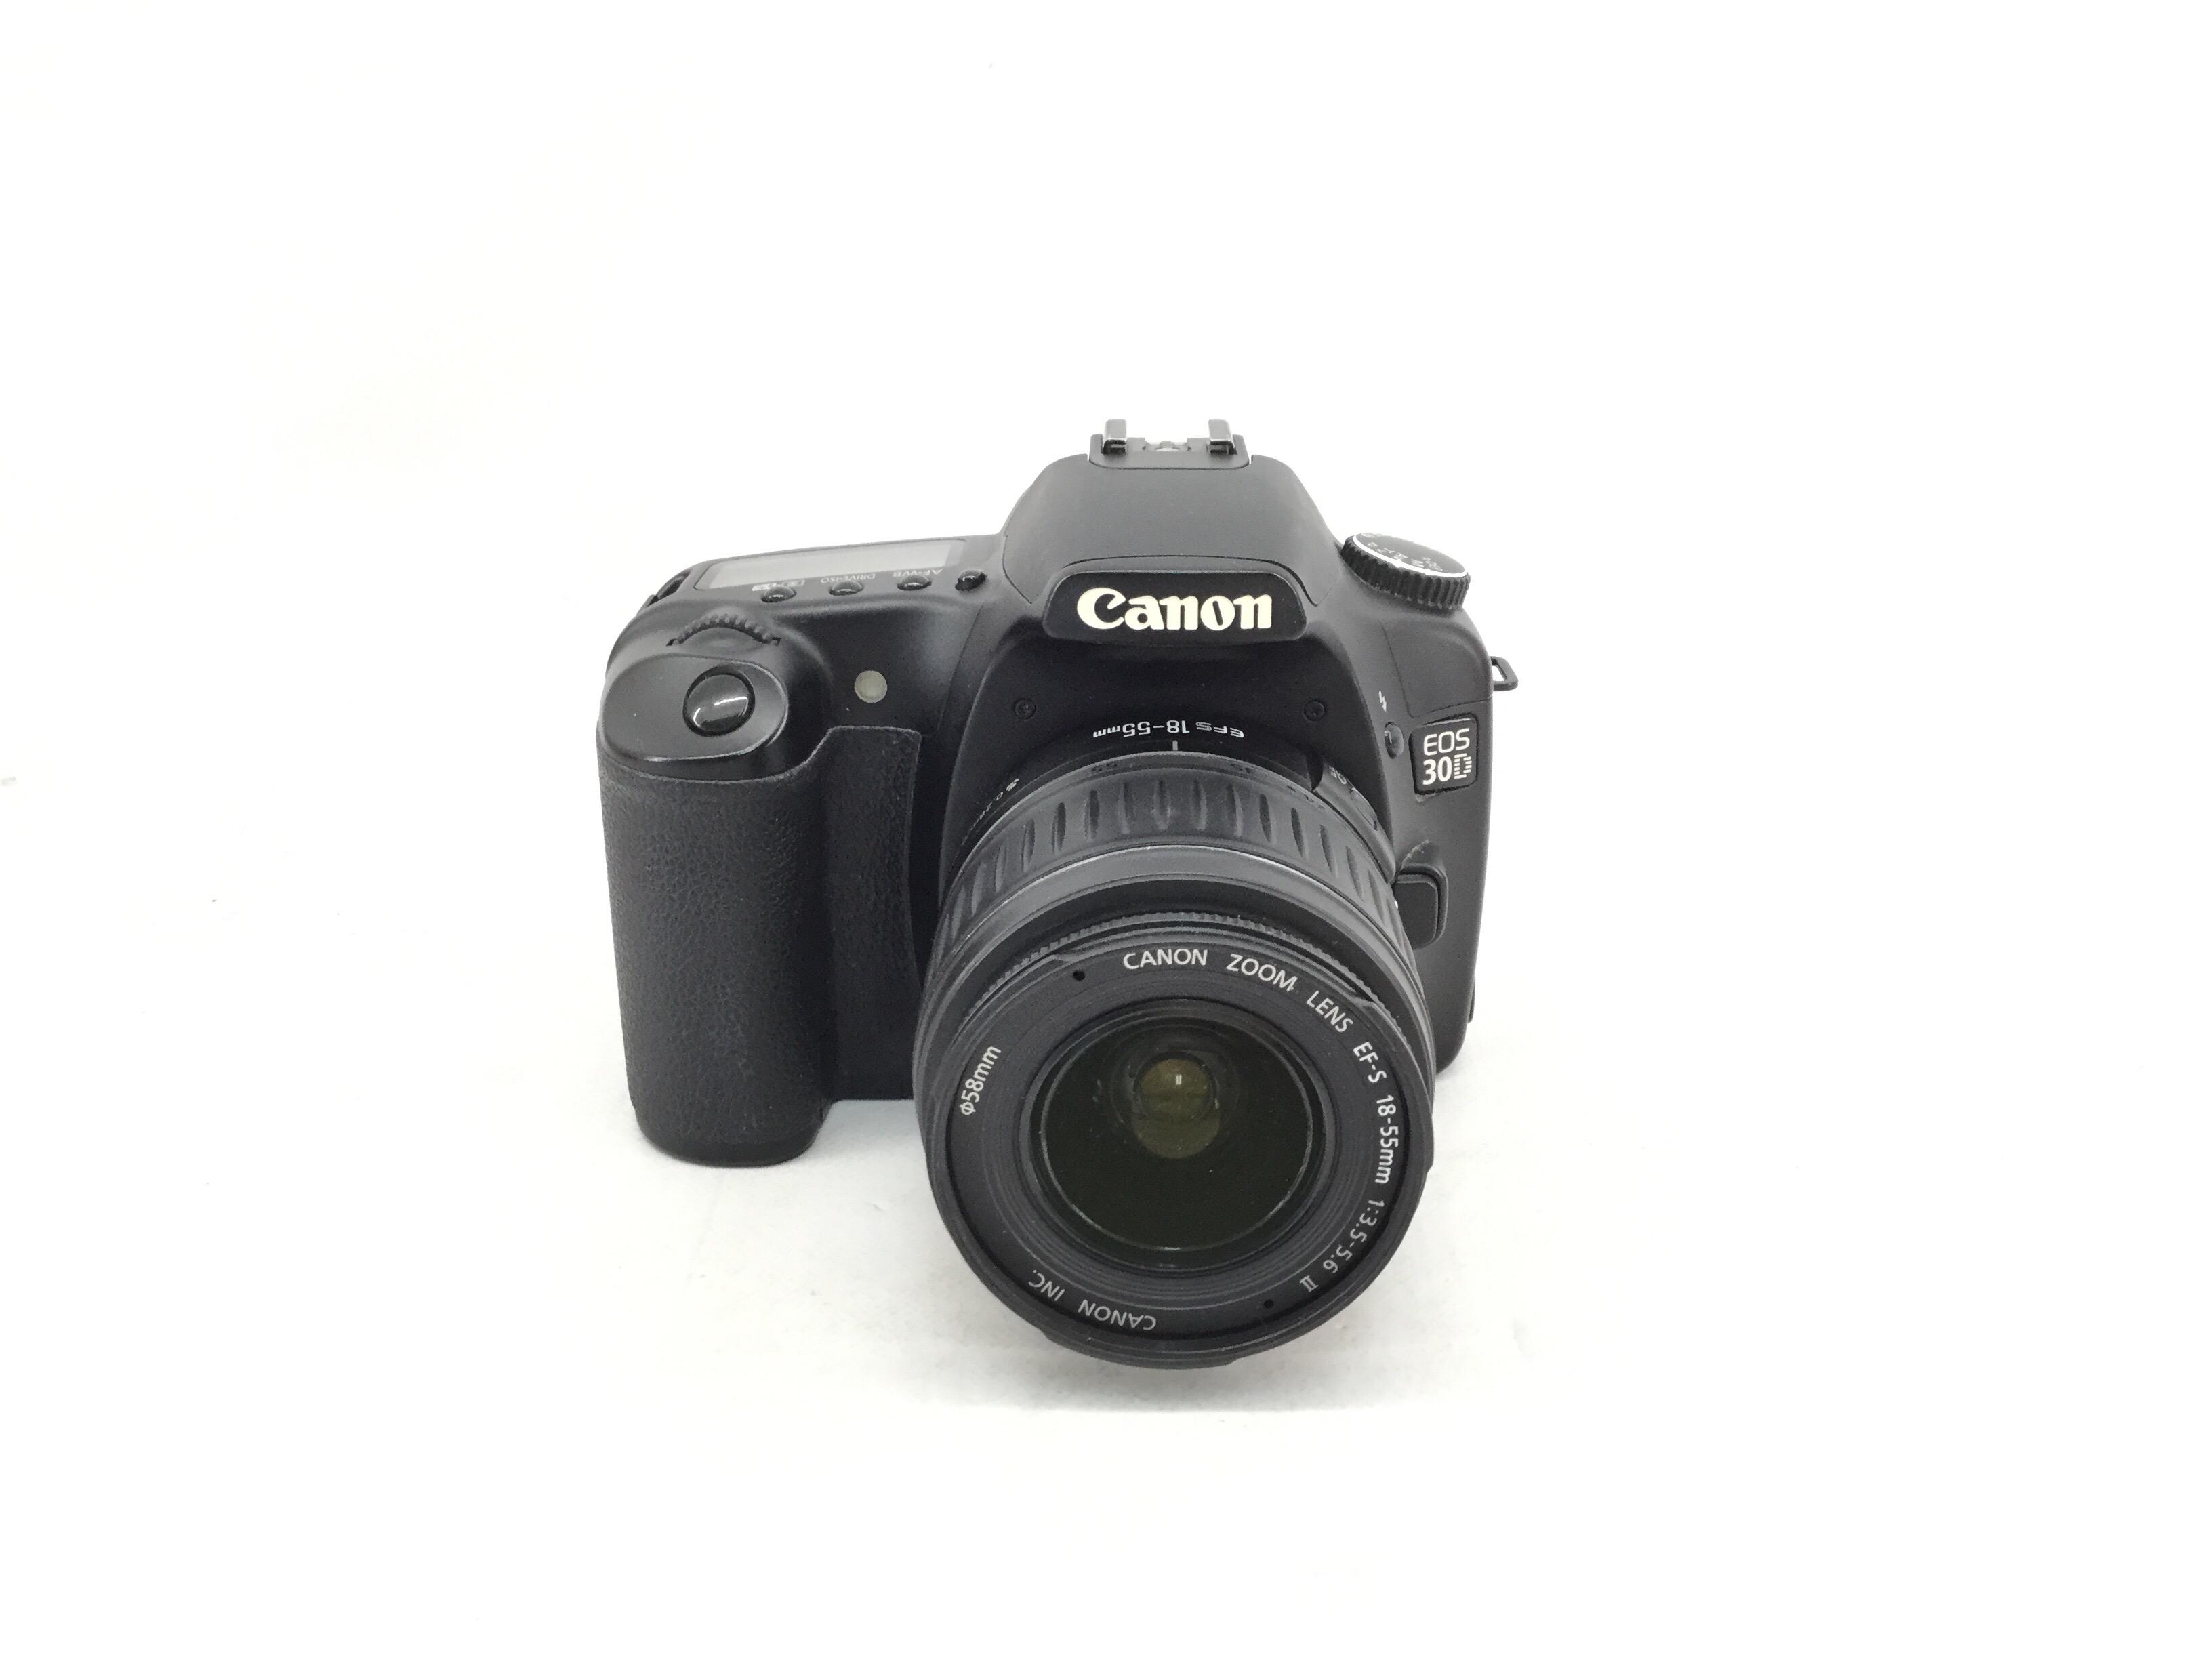 CAMARA DIGITAL REFLEX CANON EOS 30D+EF